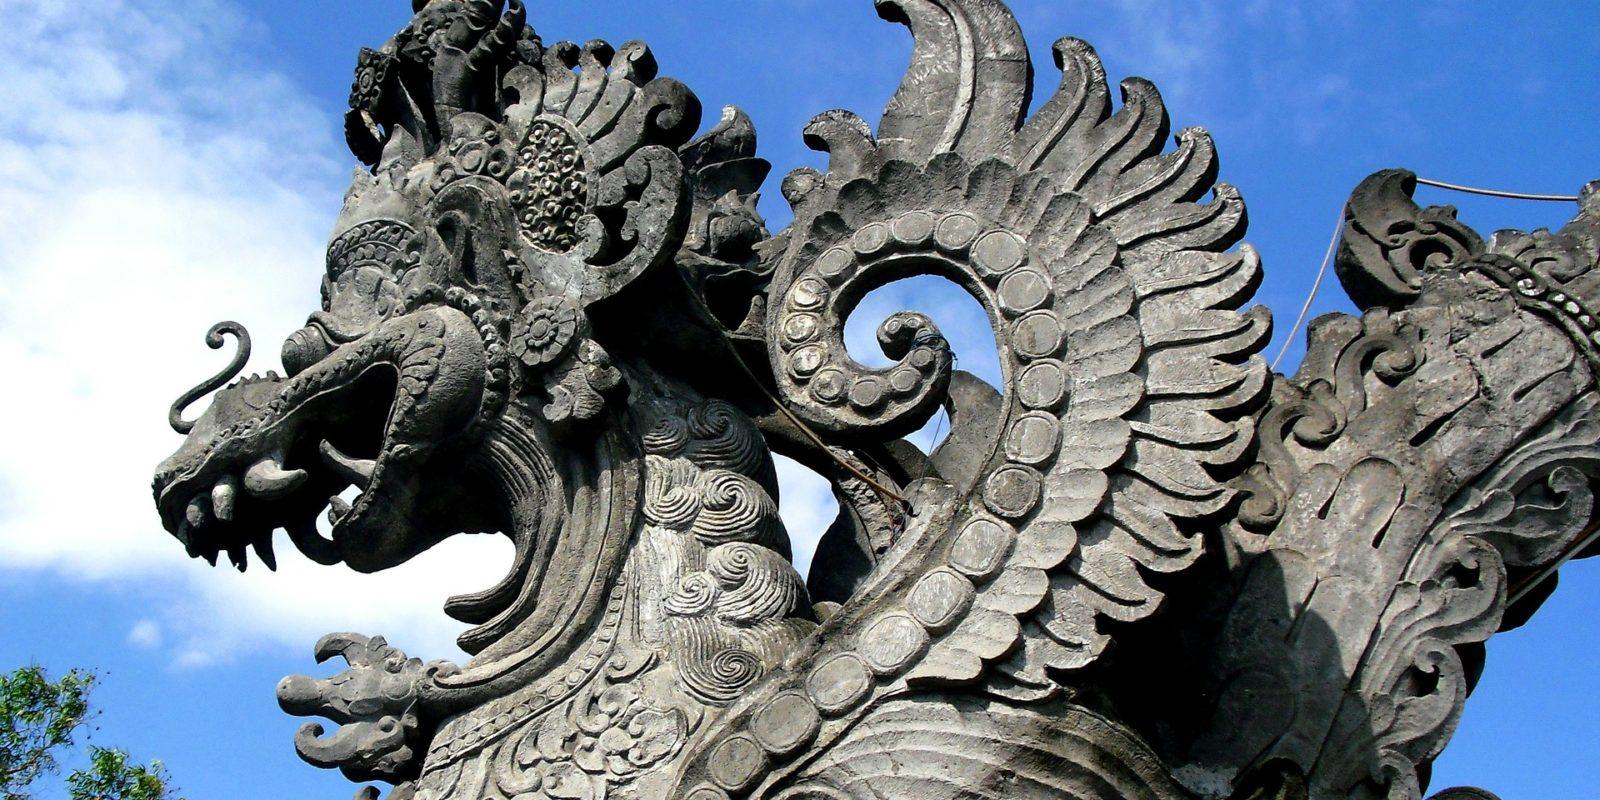 Garuda, stone sculpture, Bali, Indonesia.